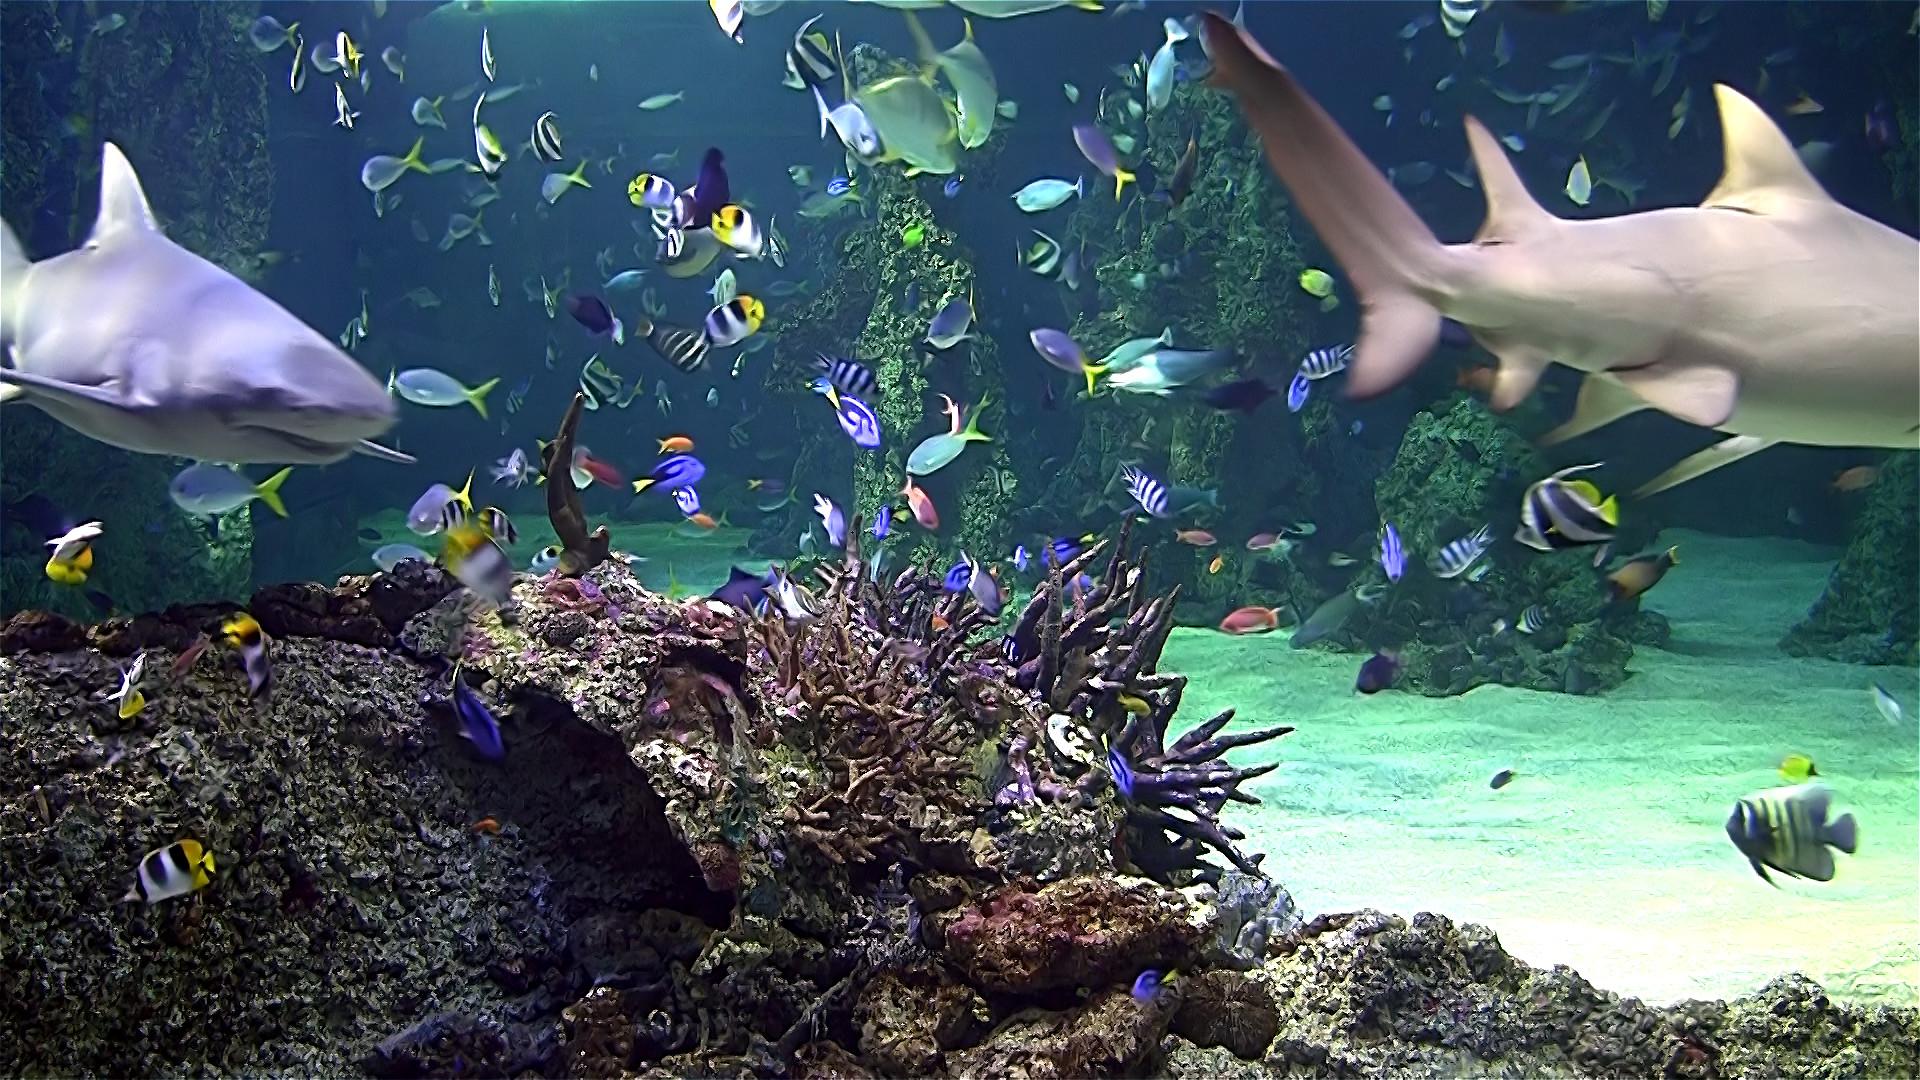 Aquarium Screensaver Free Download For Windows : Aquarium live hd tv: coral  reef scenes with